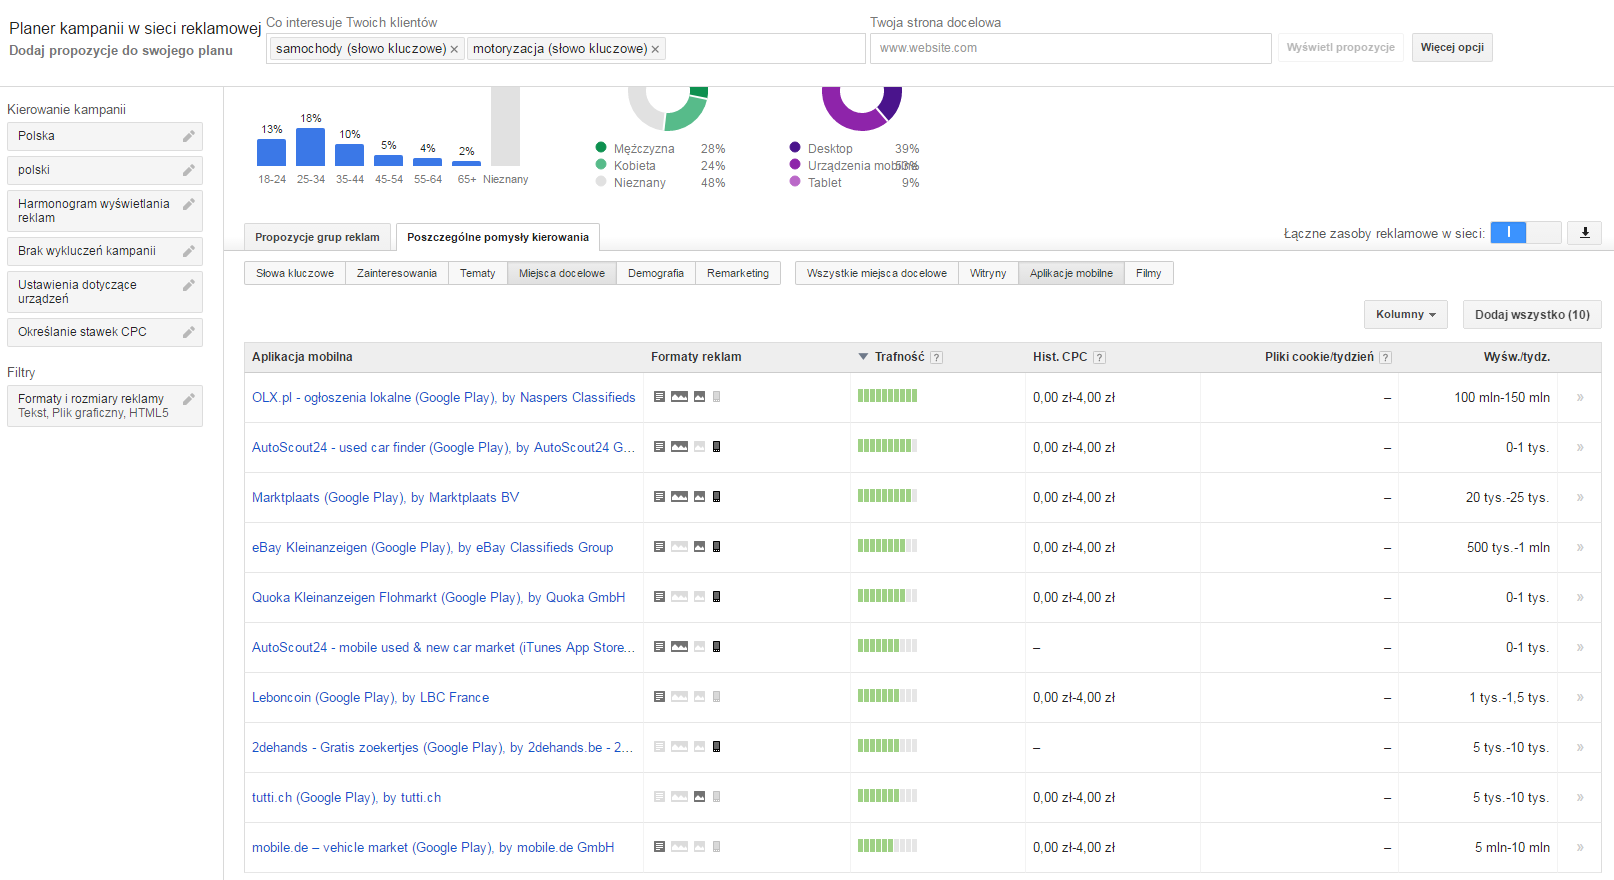 planer kampanii sieci reklamowej google